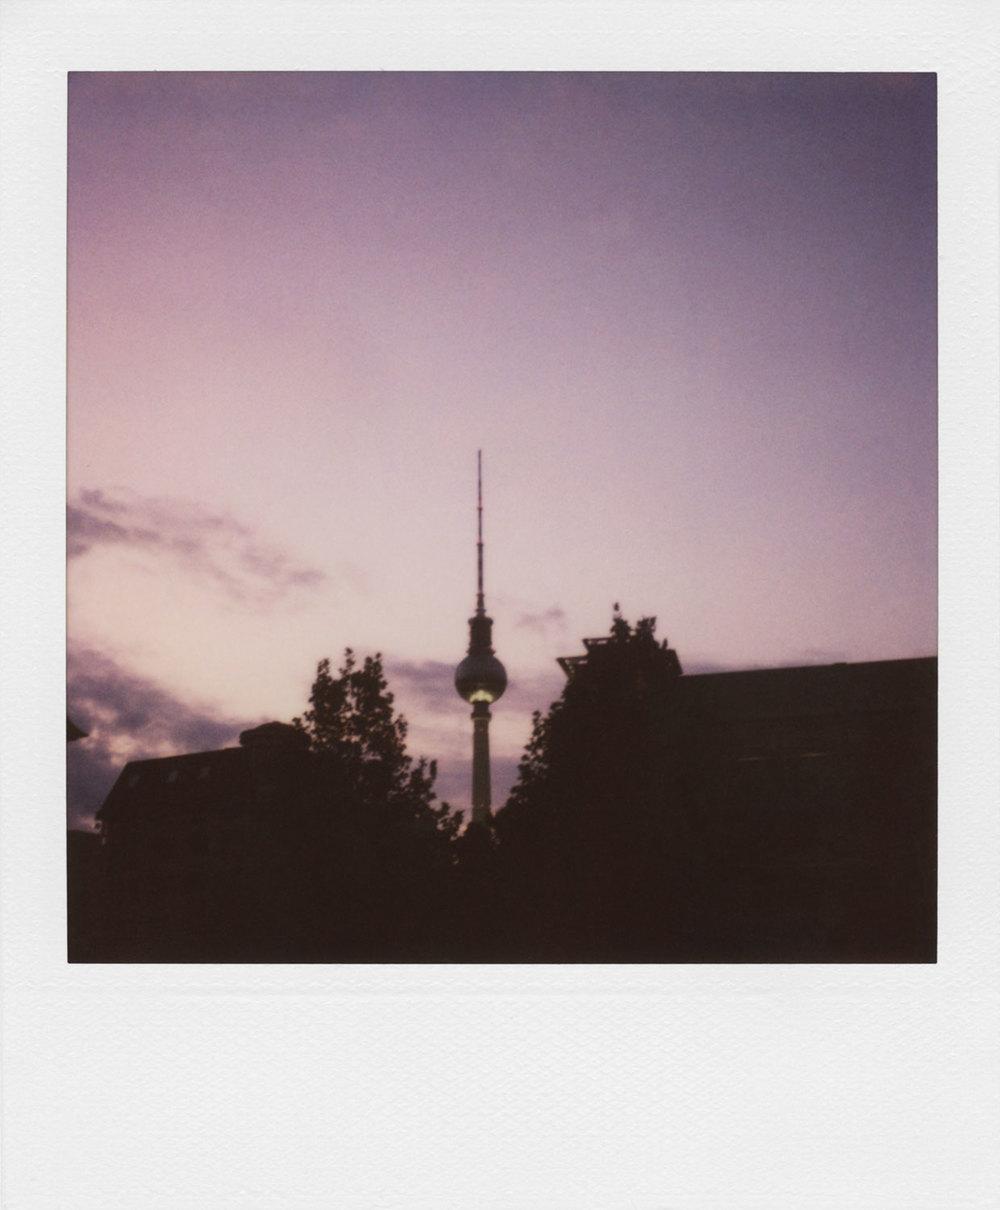 polaroid-6.jpg